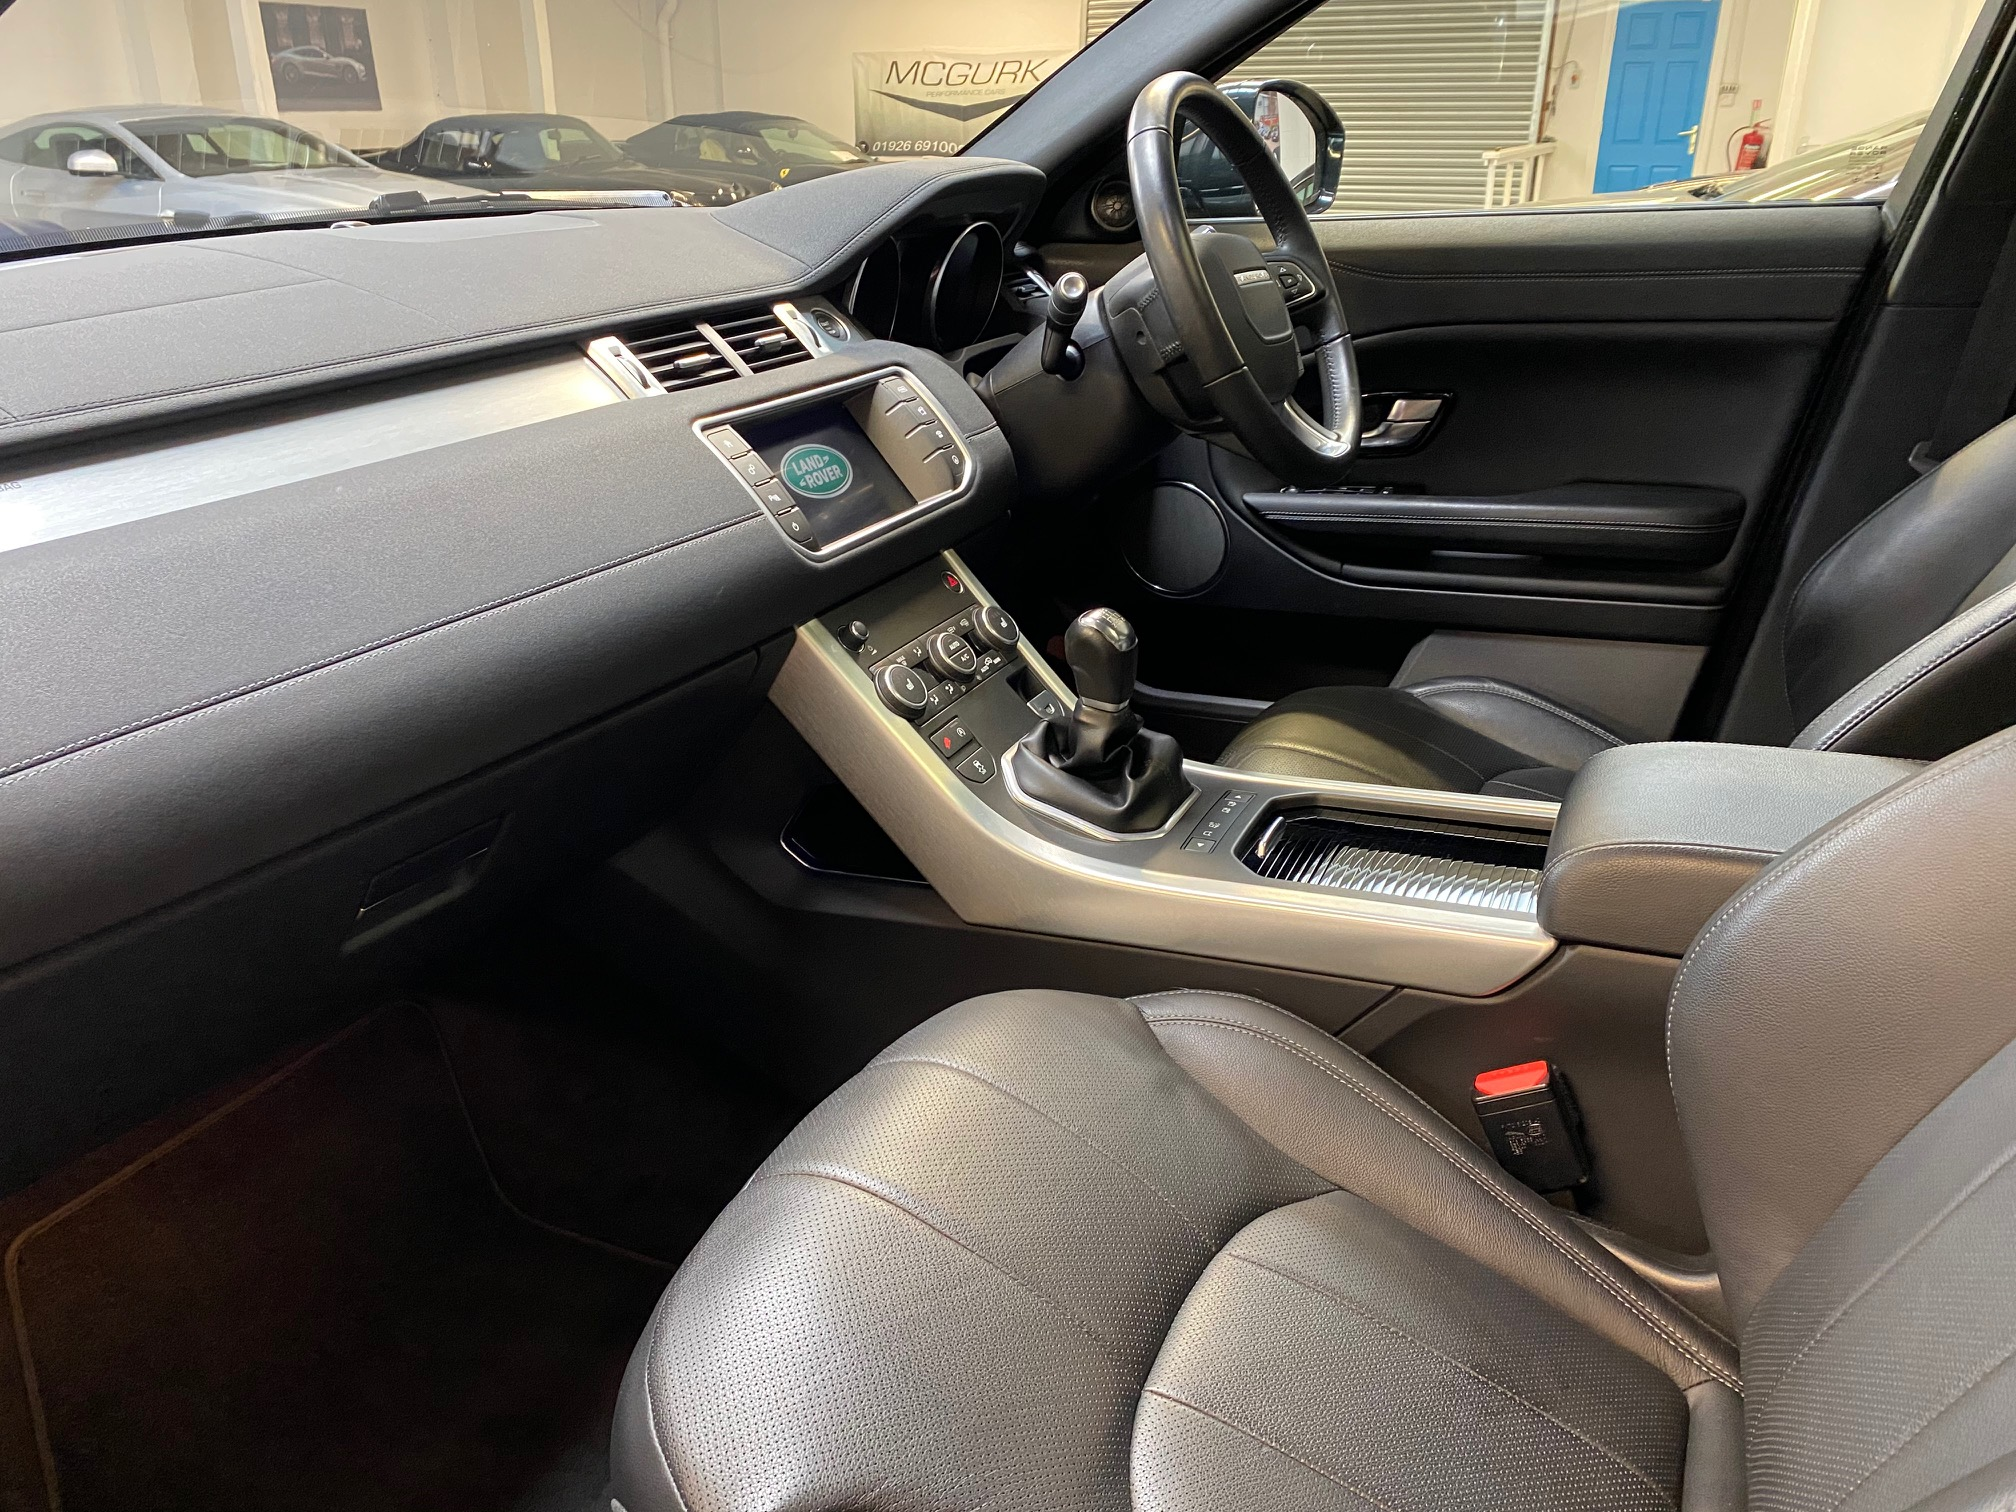 Used Range Rover Evoque for sale